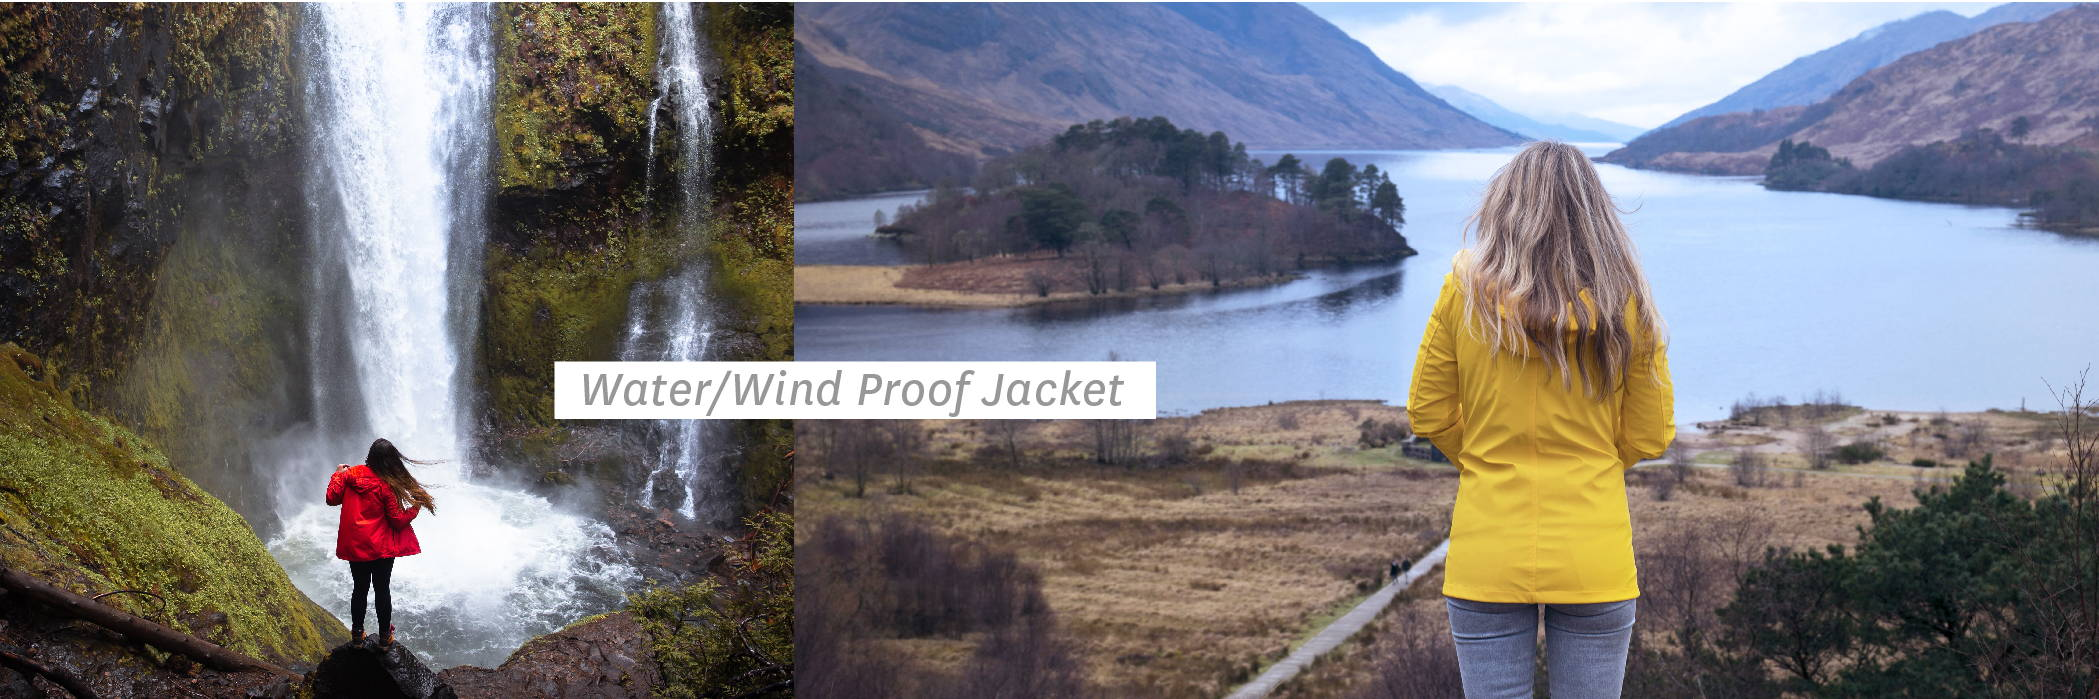 Water/Wind Proof Jacket